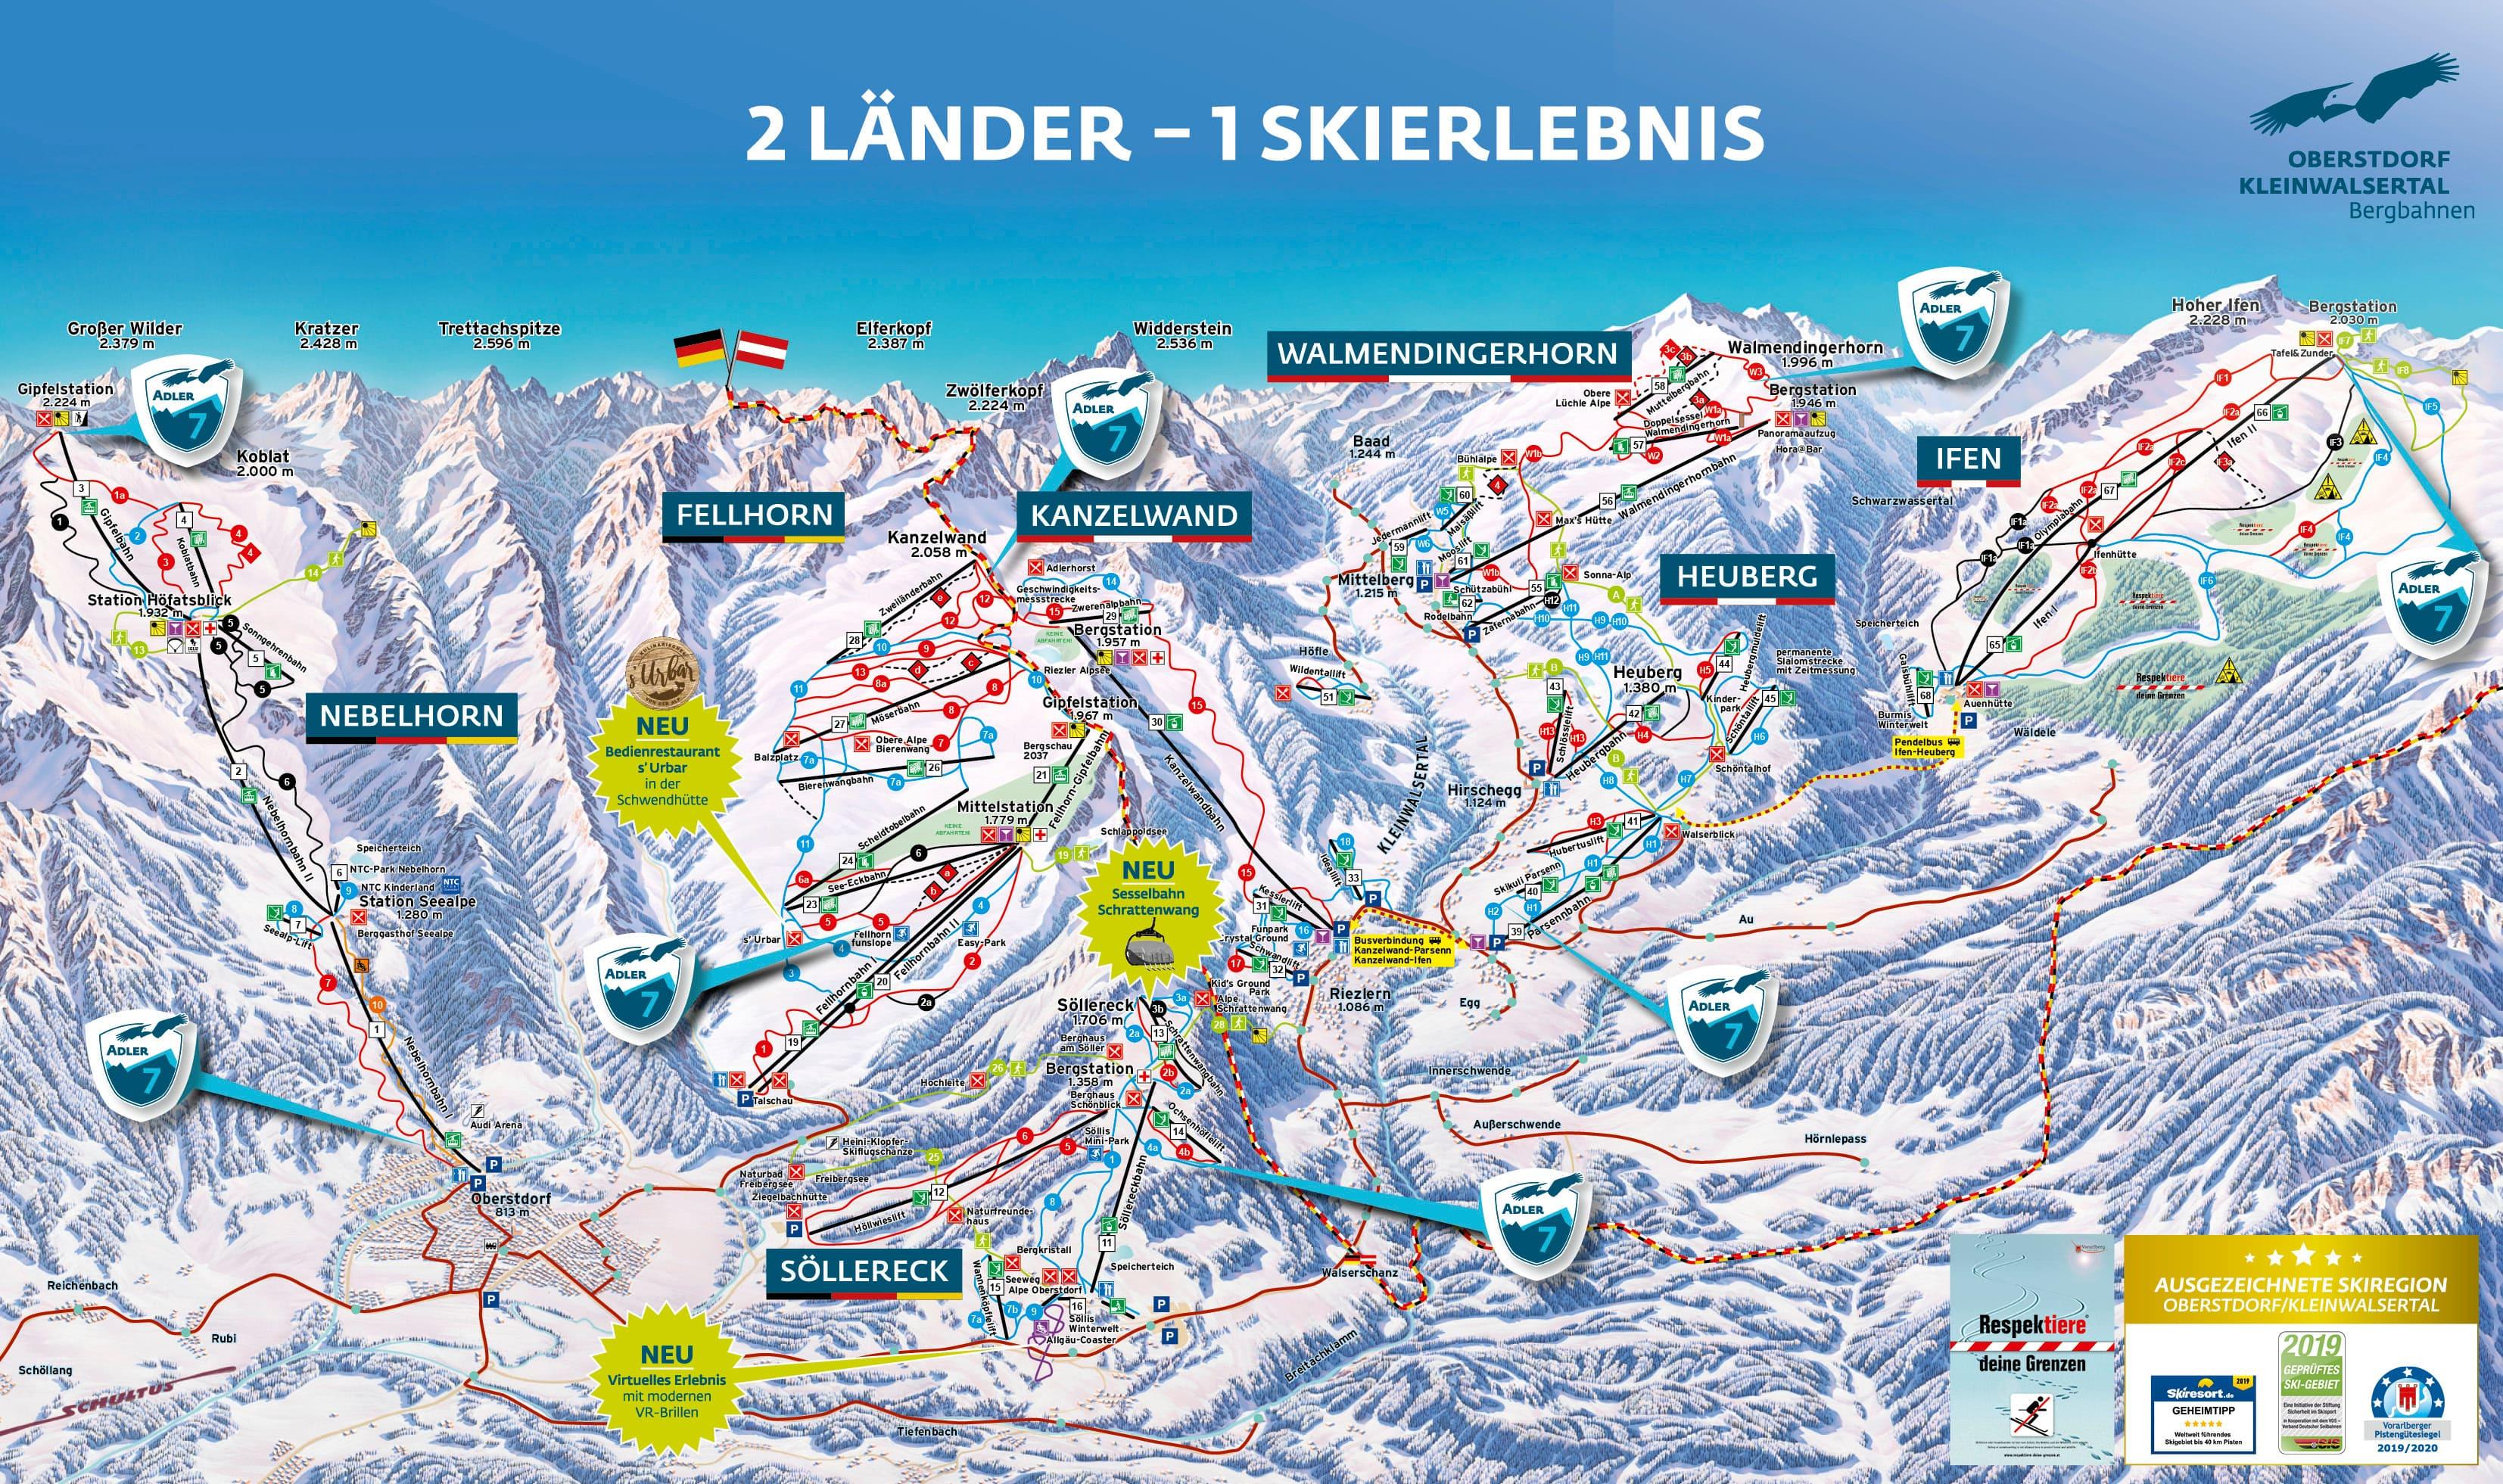 Oberstdorf-Nebelhorn Piste / Trail Map